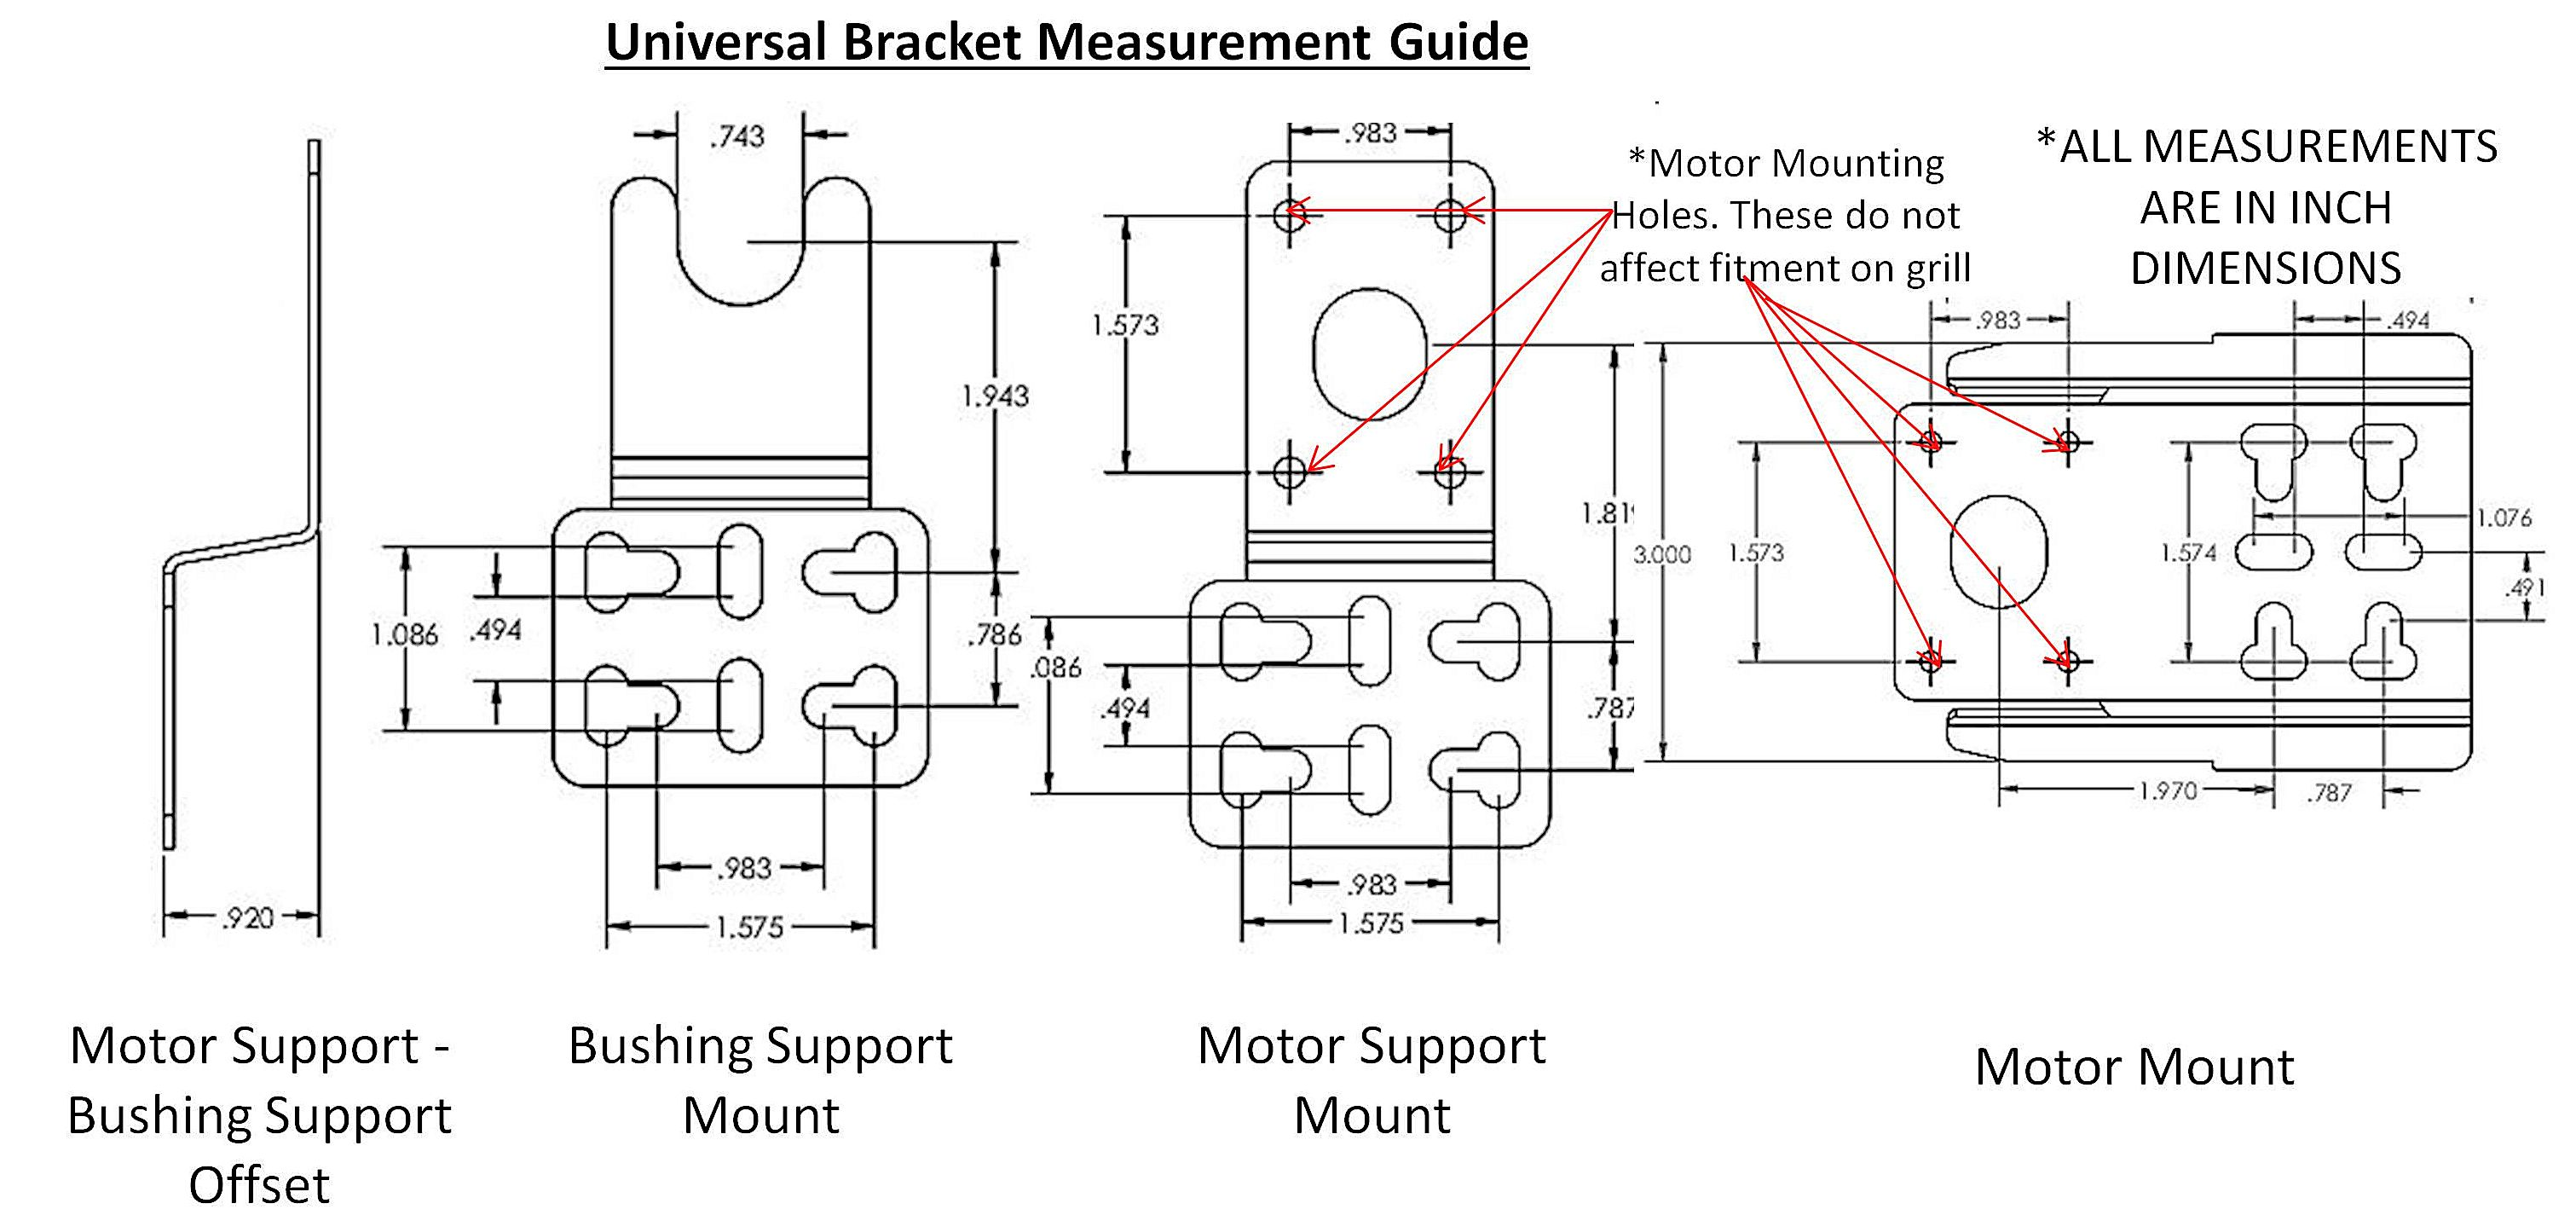 Grill Rotisserie Universal Motor Mounting Bracket Set Chrome